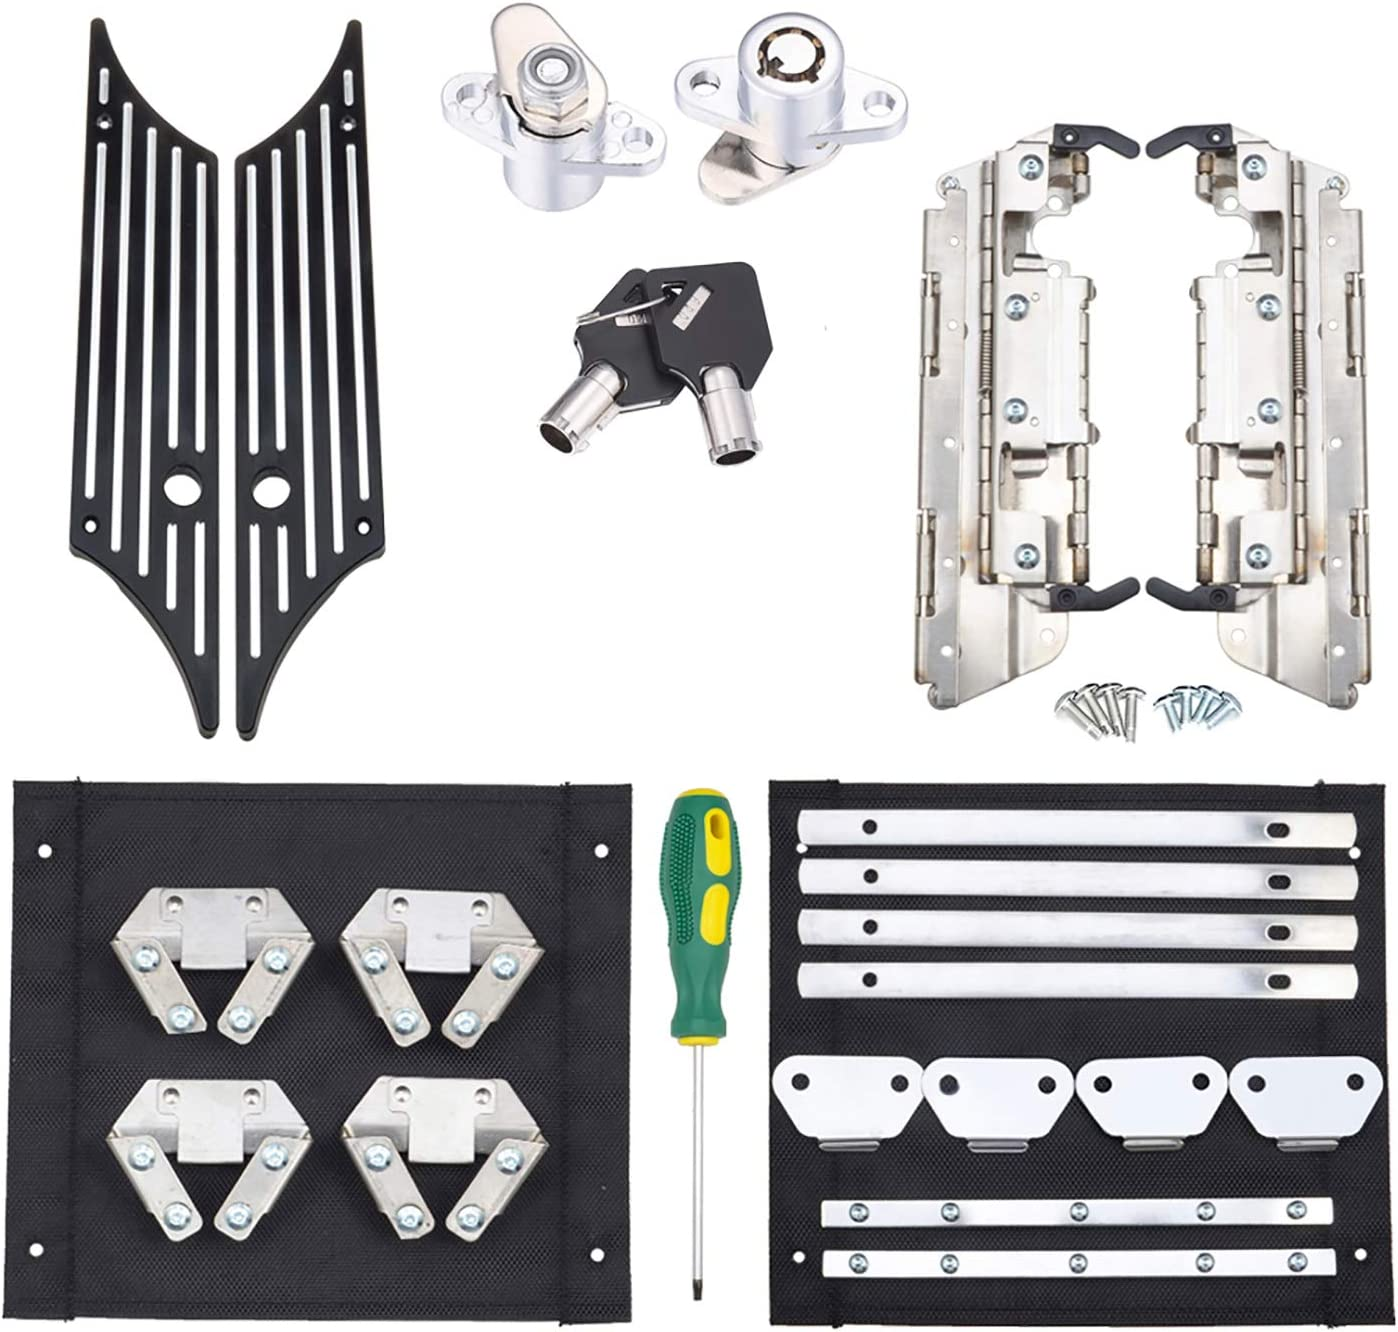 Aluminum Black Latch Covers Locks Keys Saddle Bag Compatible for Harley Davidson Touring Street Glide//Electra Glide//Road King//Road Glide 1993-2013 Amazicha Saddlebag Latch Hardware Kit